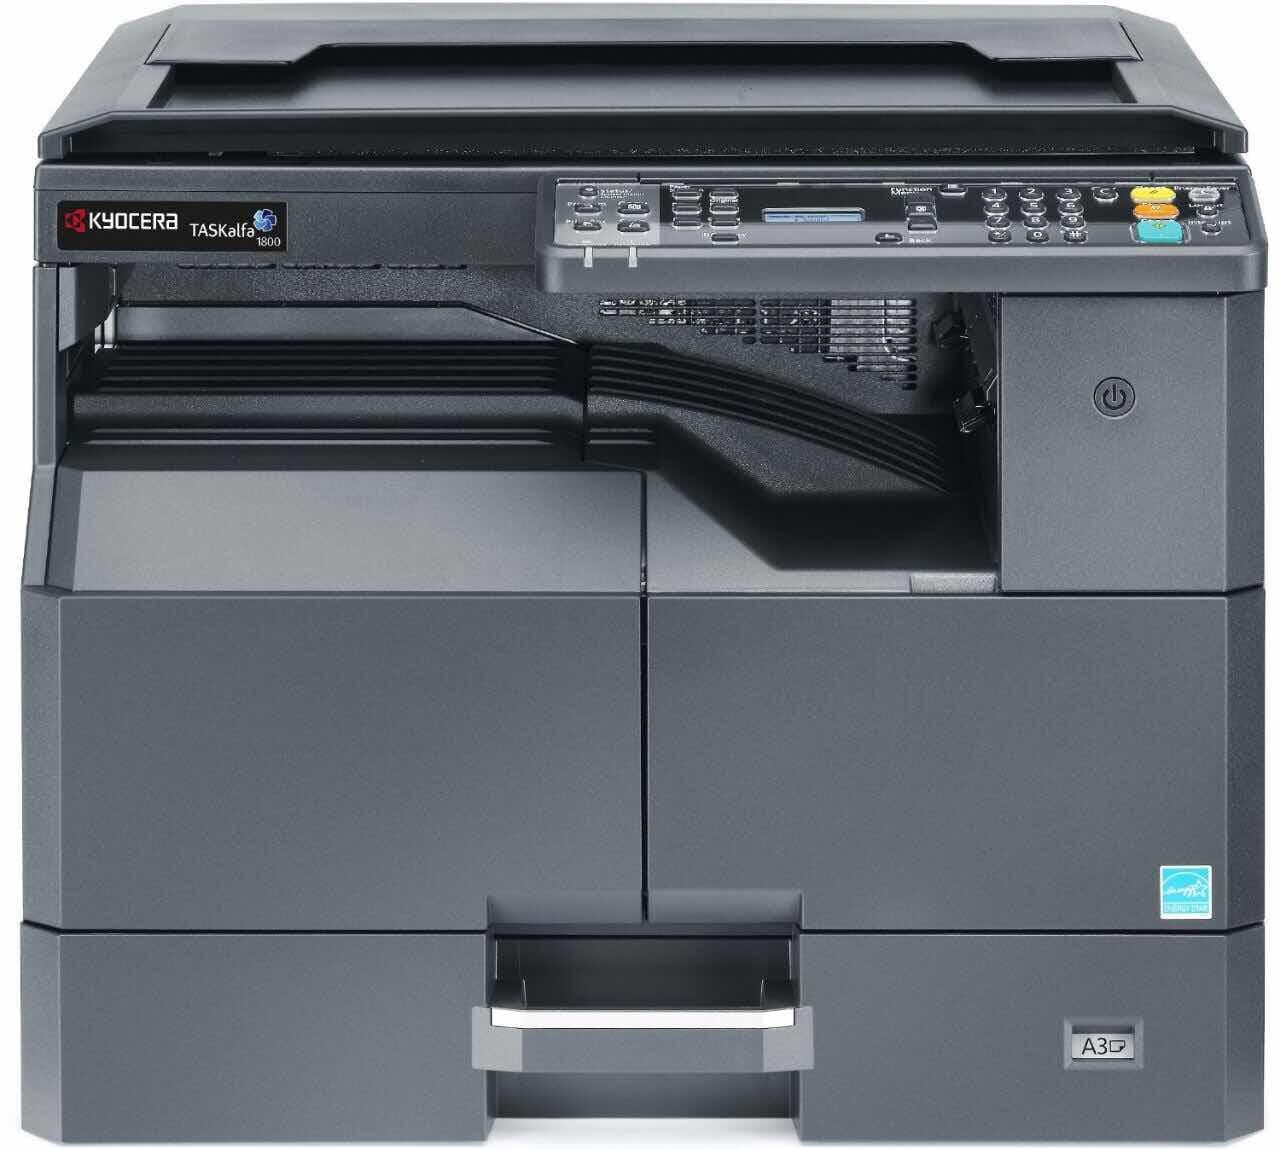 Top 10 Ricoh Photocopier Dealers in Nashik - Best Ricoh